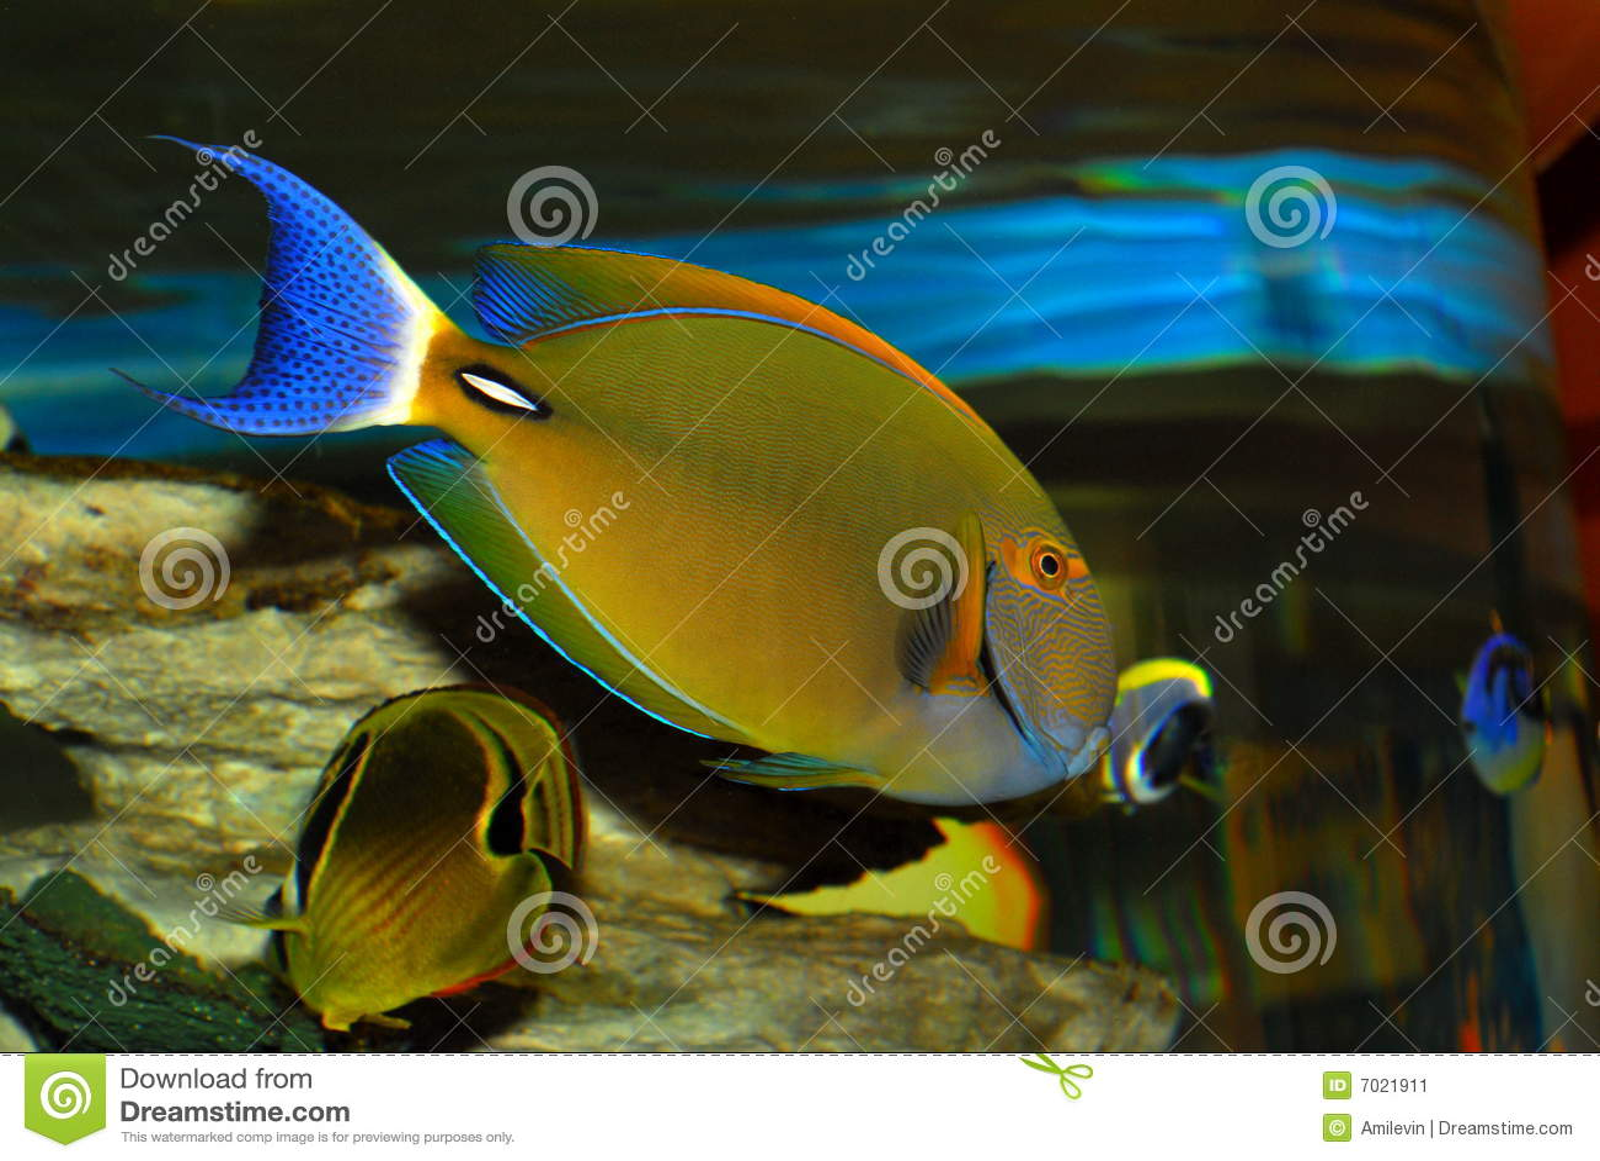 Rare Tropical Fish Stock Image Image 7021911